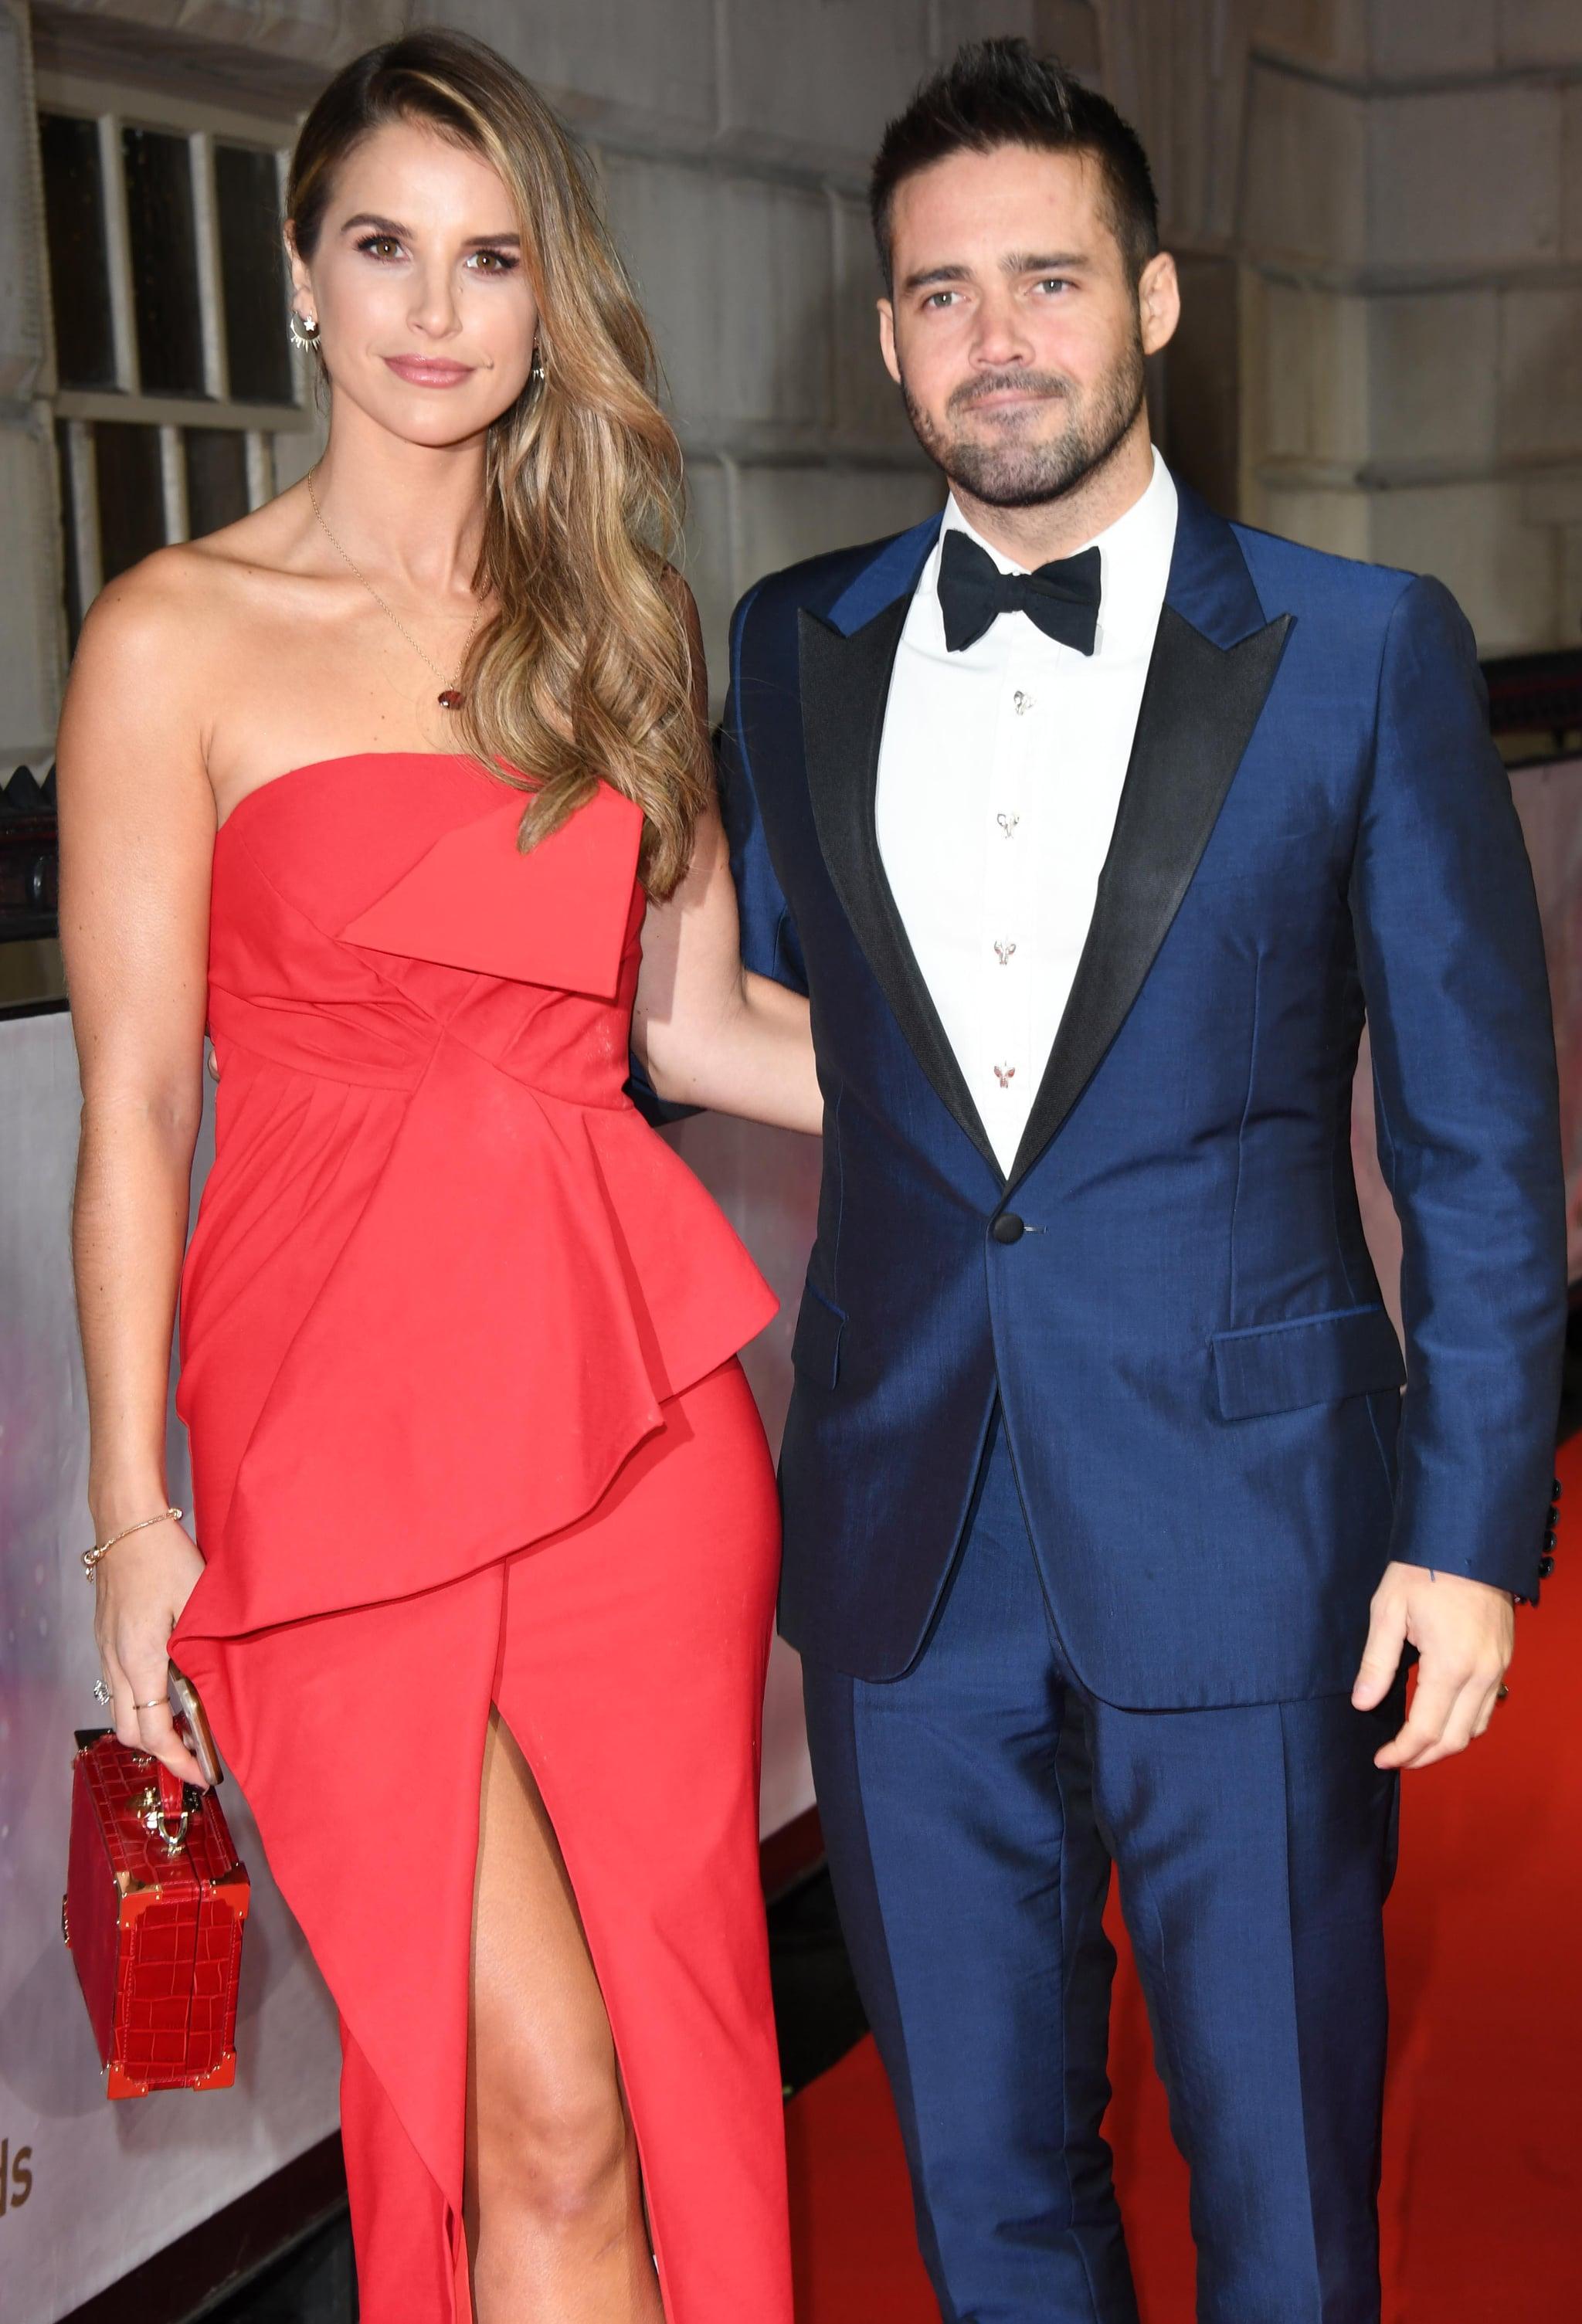 LONDON, ENGLAND - DECEMBER 13:  Vogue Williams and Spencer Matthews